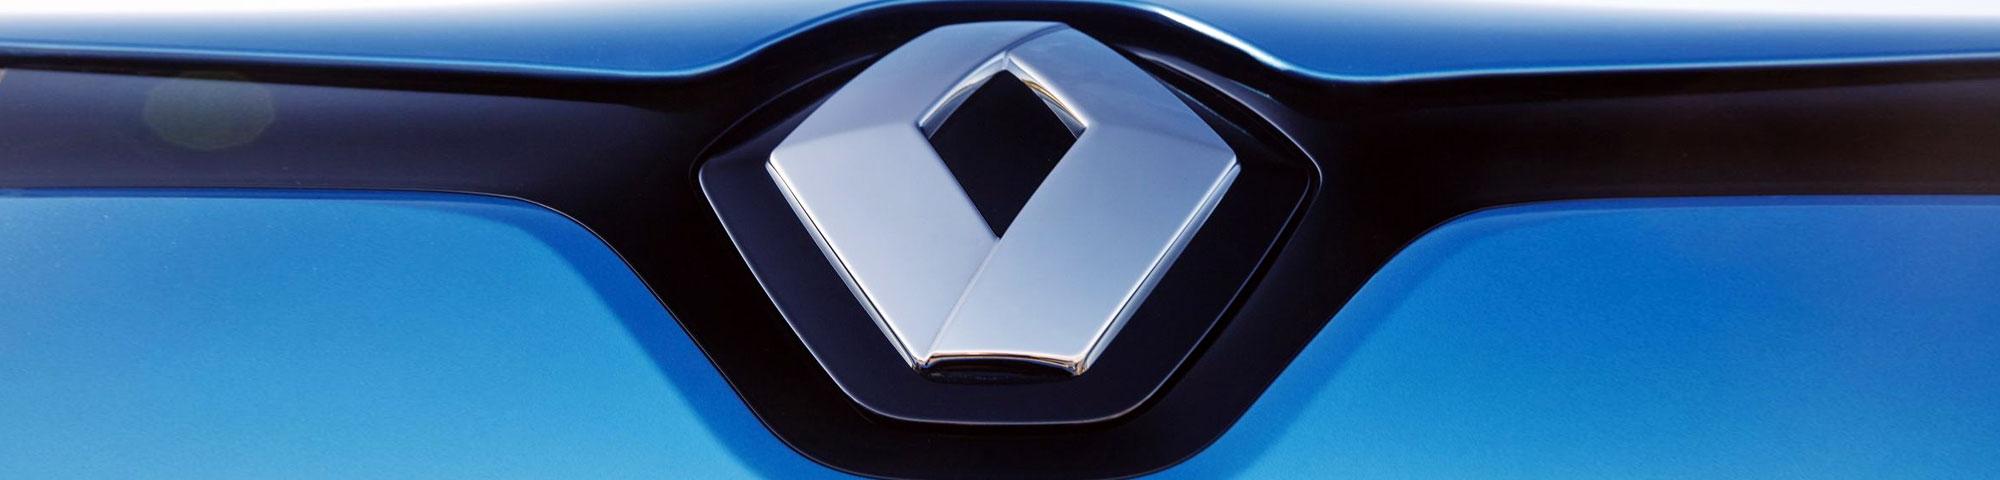 CLMS - Manufacturer - Renault